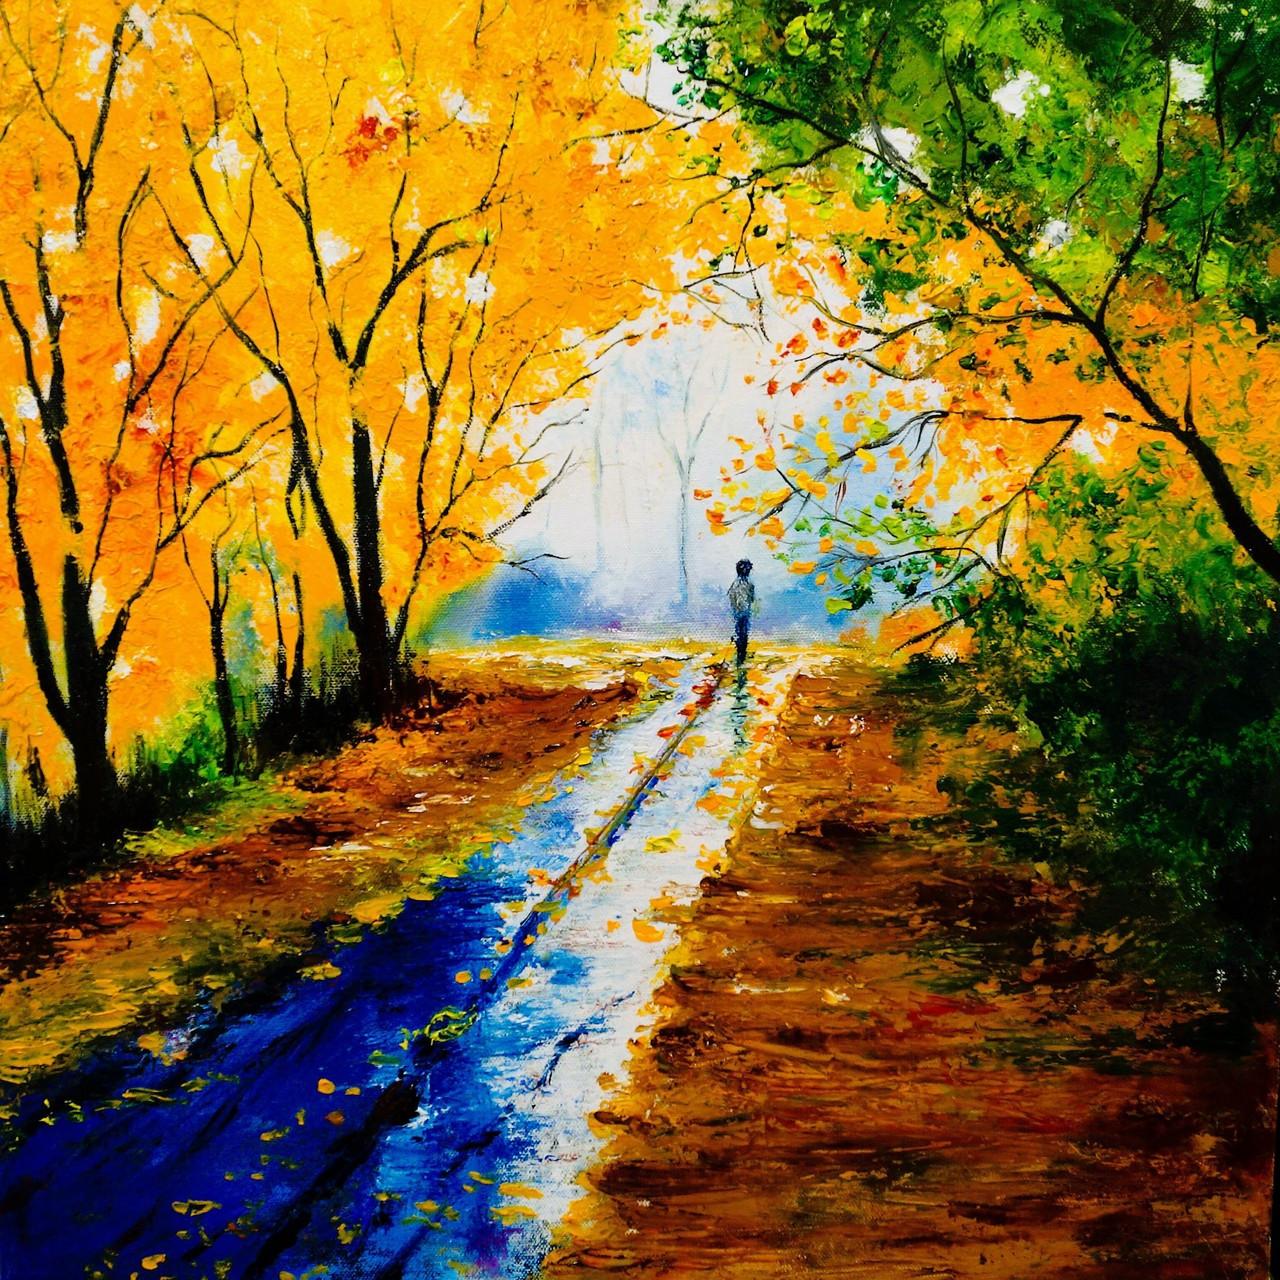 nature painting paintings 2235 oil 18in amar yadav india handpainted artist handmade